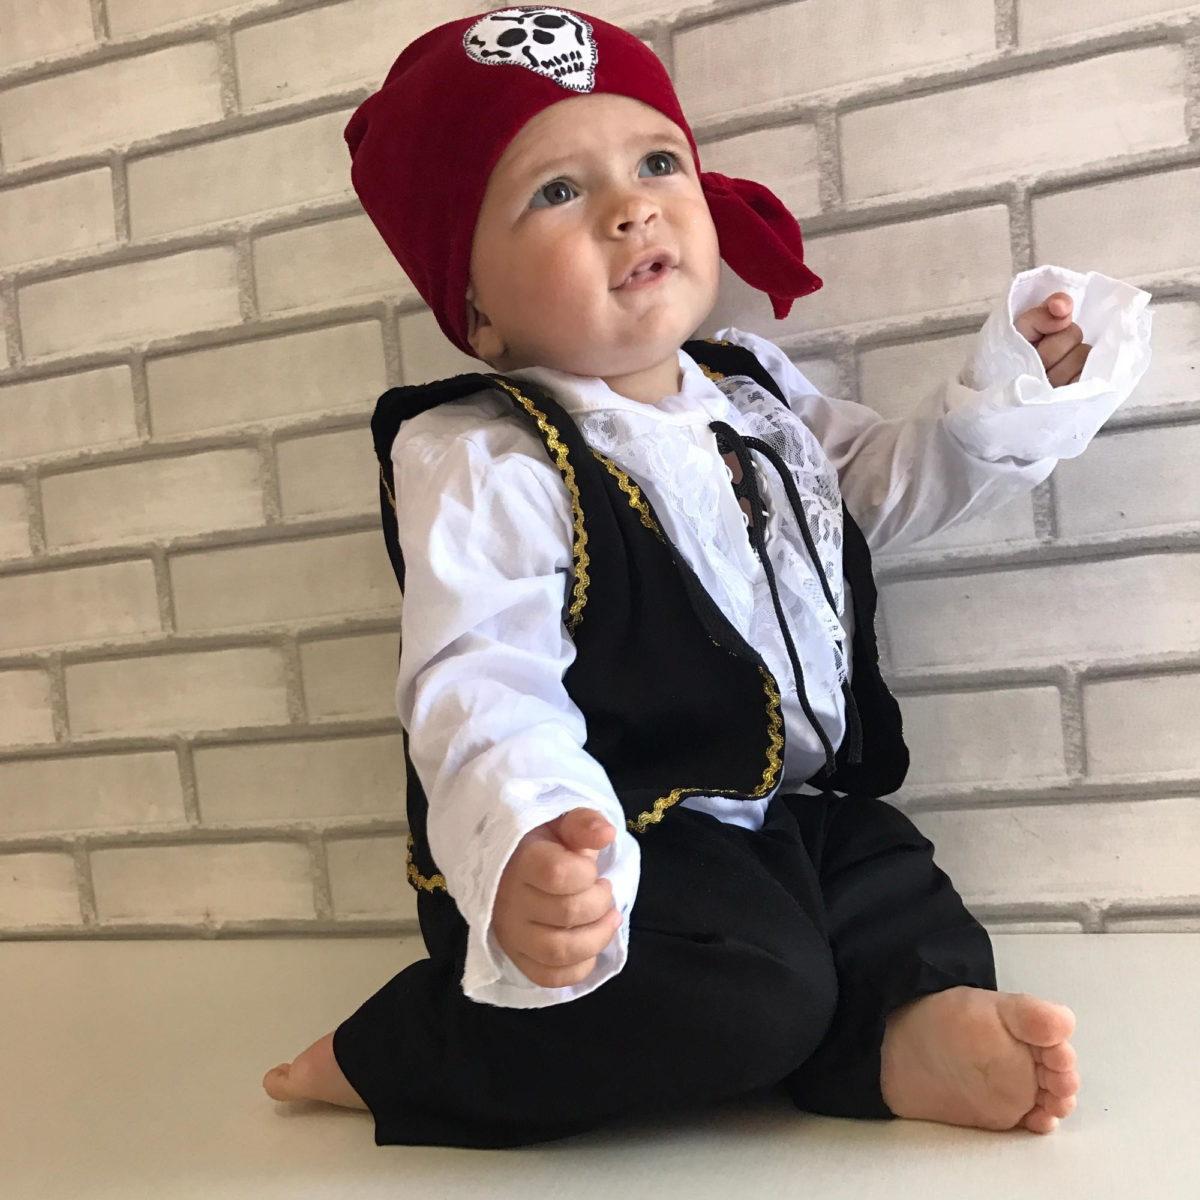 bebe usando fantasia de carnaval de pirata